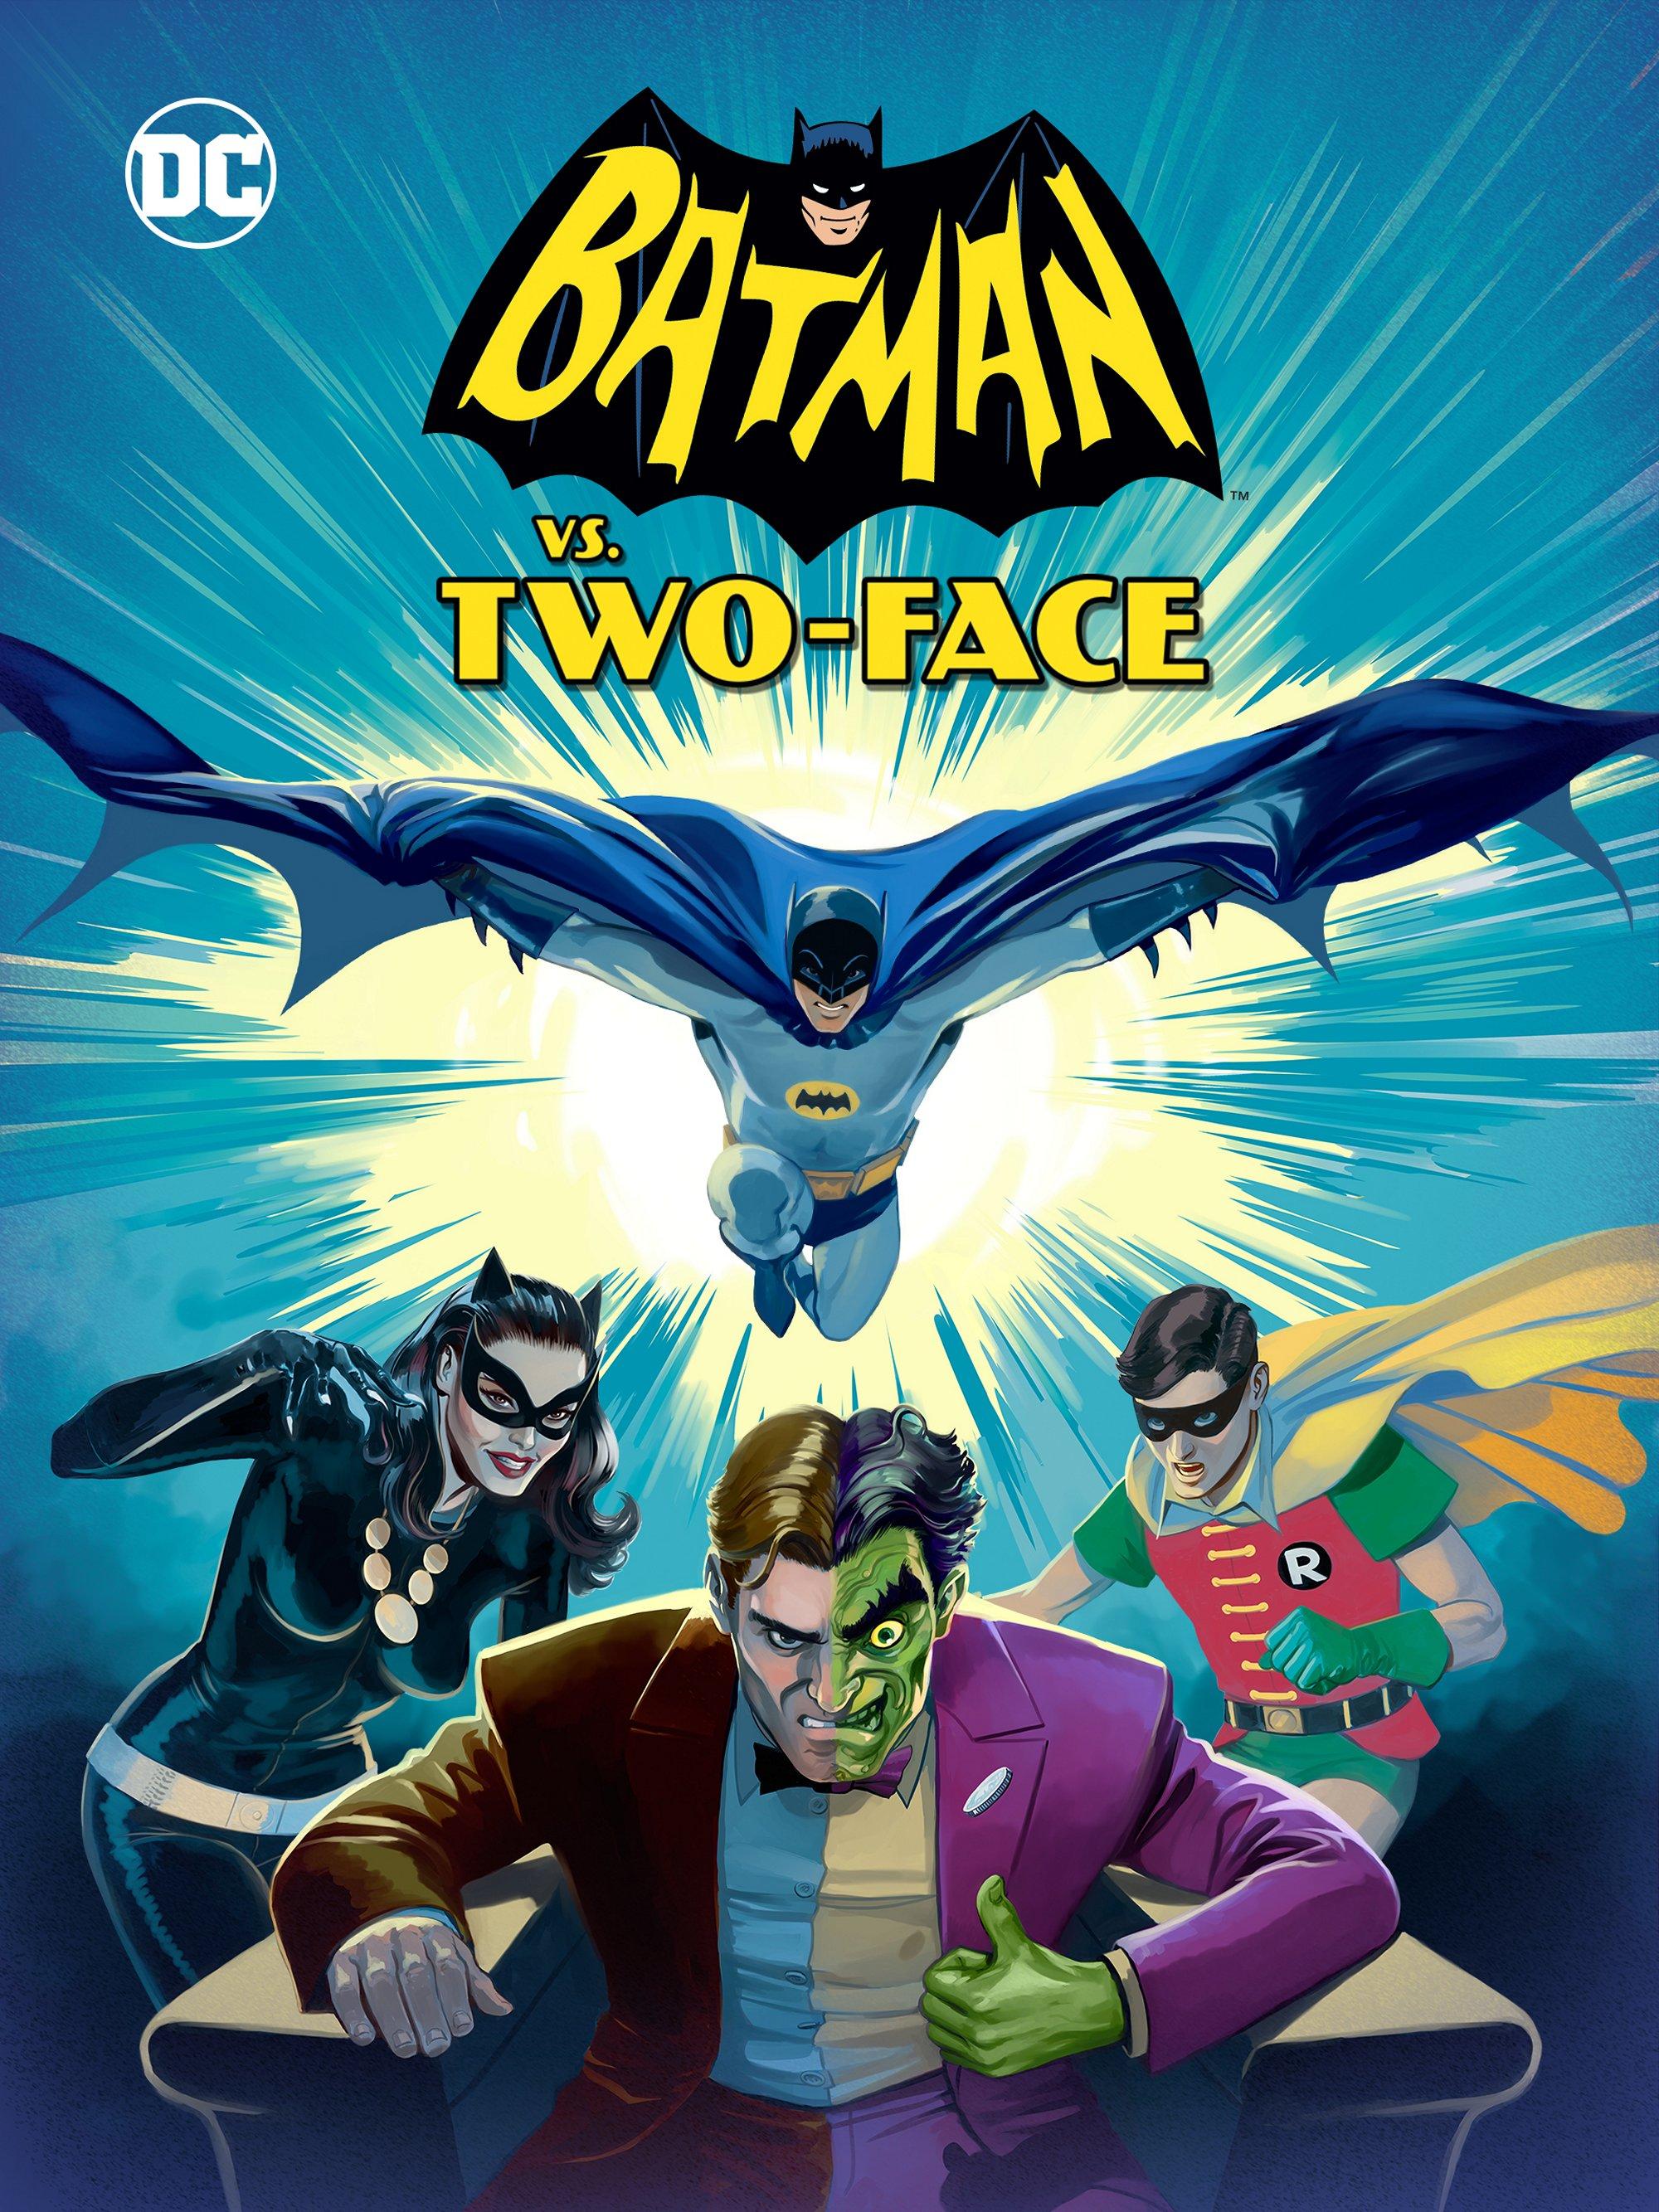 BatmanVTwoface_H_DD_KA_TT_1920x2560_300dpi_EN_fe7c7f35